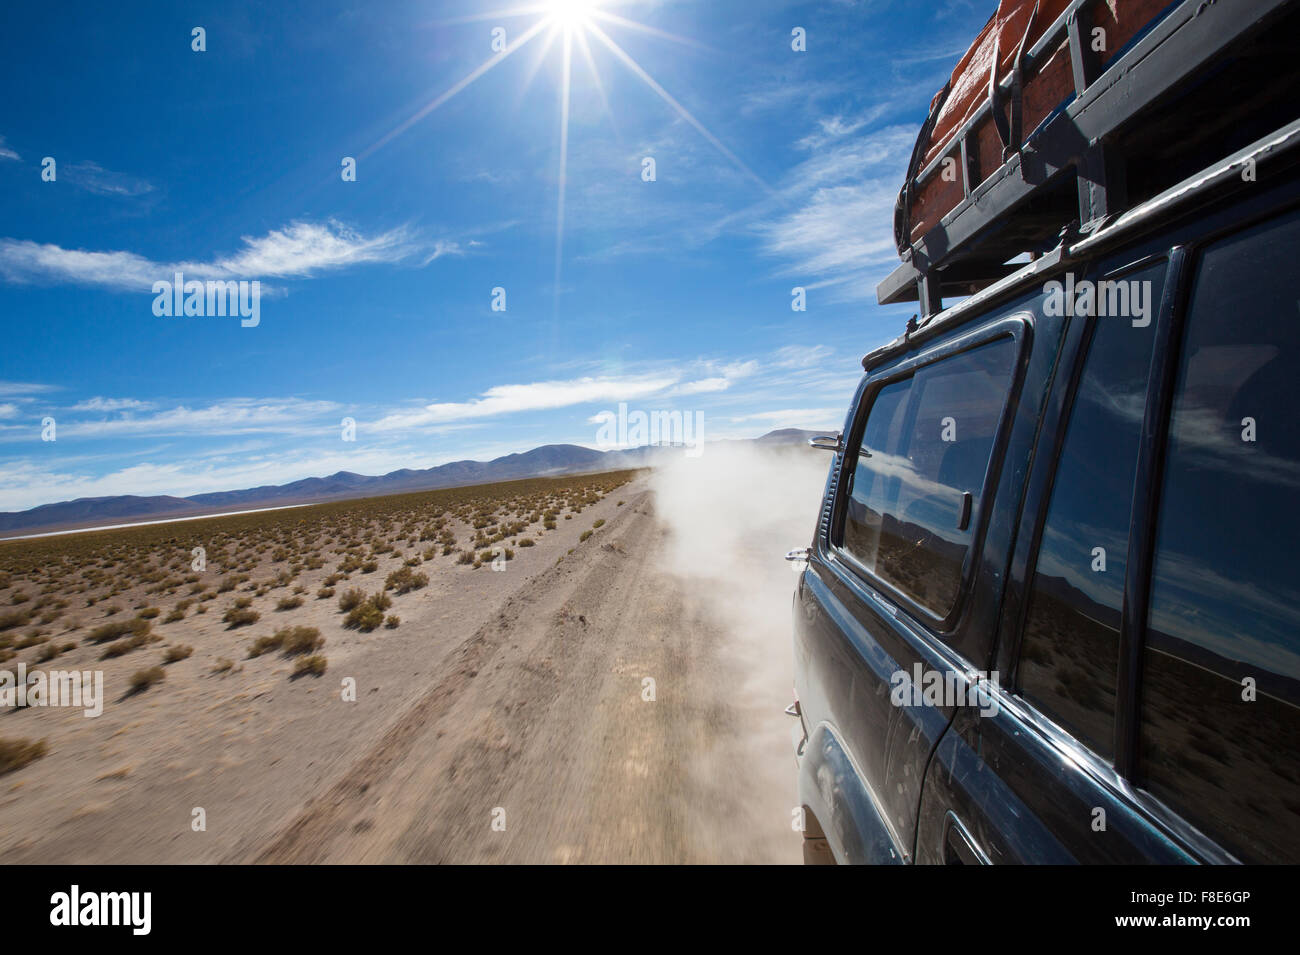 Off-Road-Fahrzeug fährt in der Atacama-Wüste, Bolivien mit Bergen und blauem Himmel in Eduardo Avaroa Stockbild